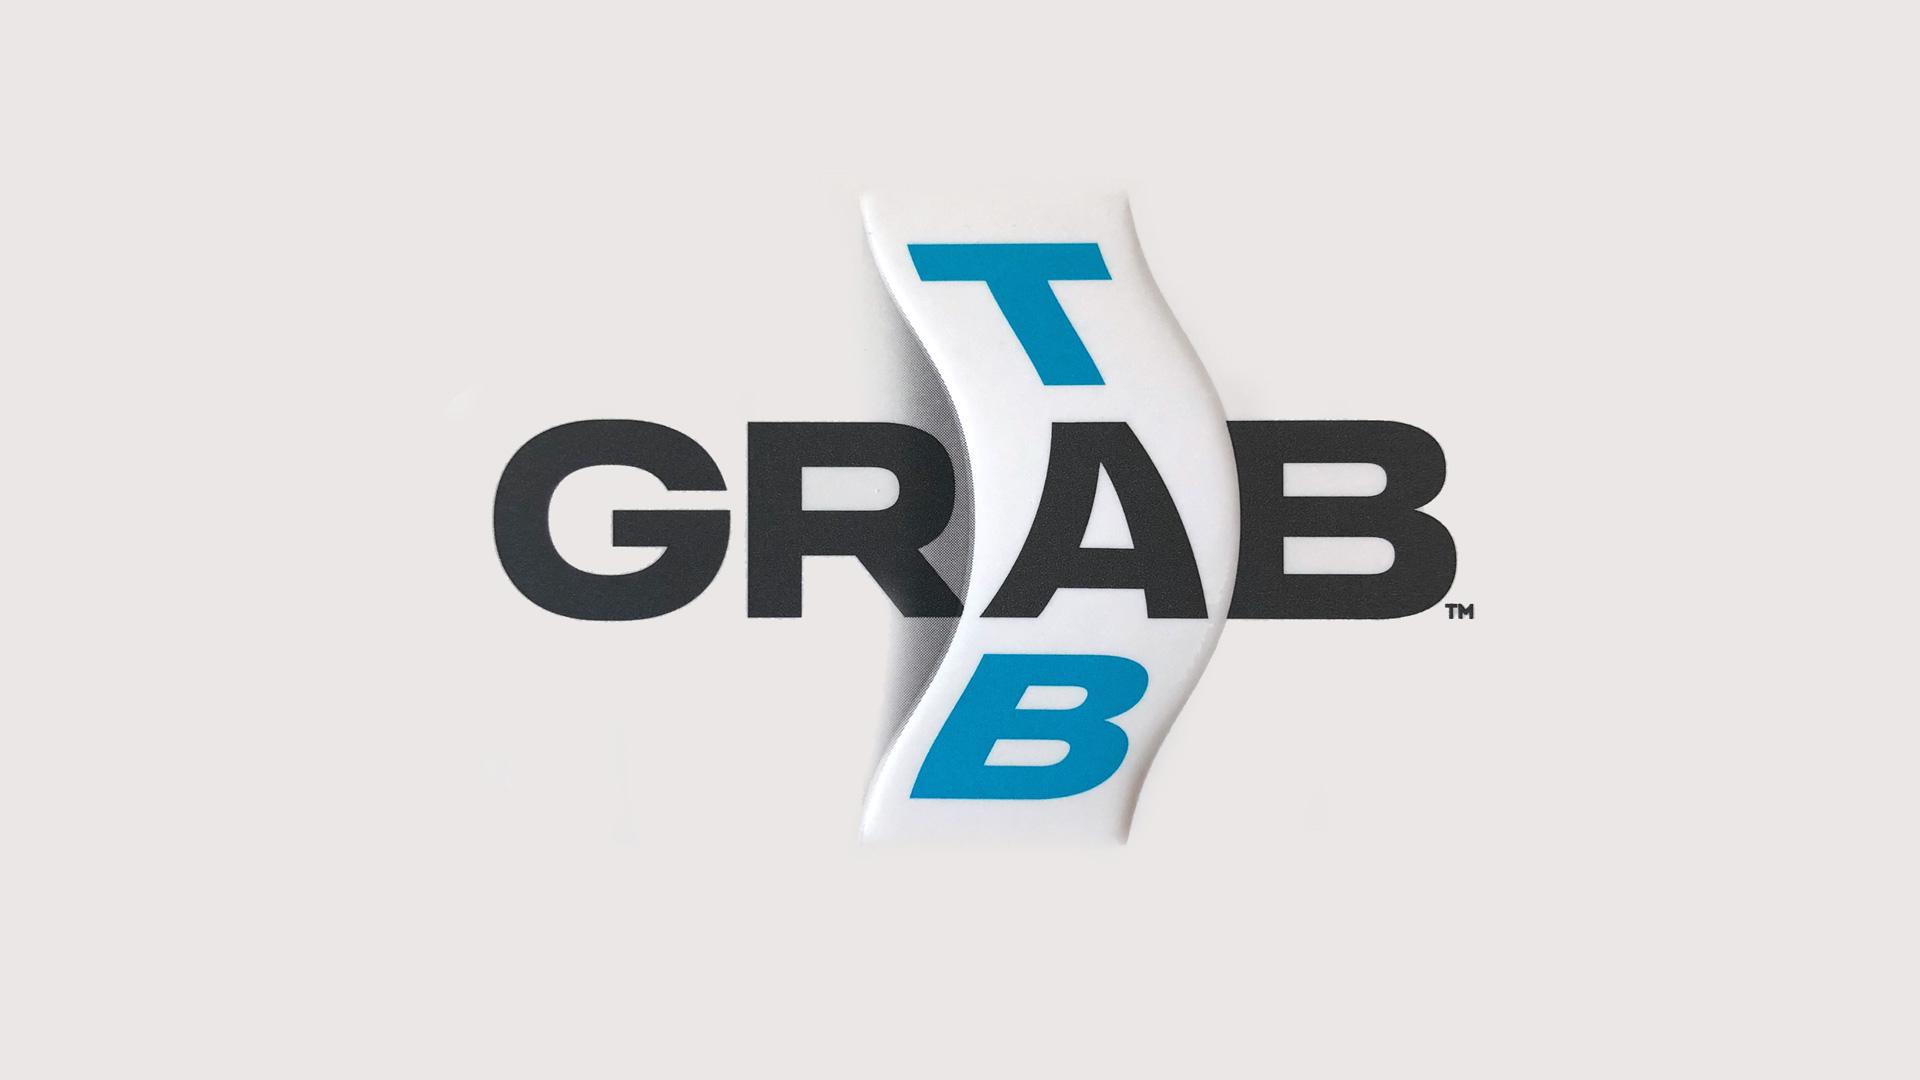 Grabtab_redesign2